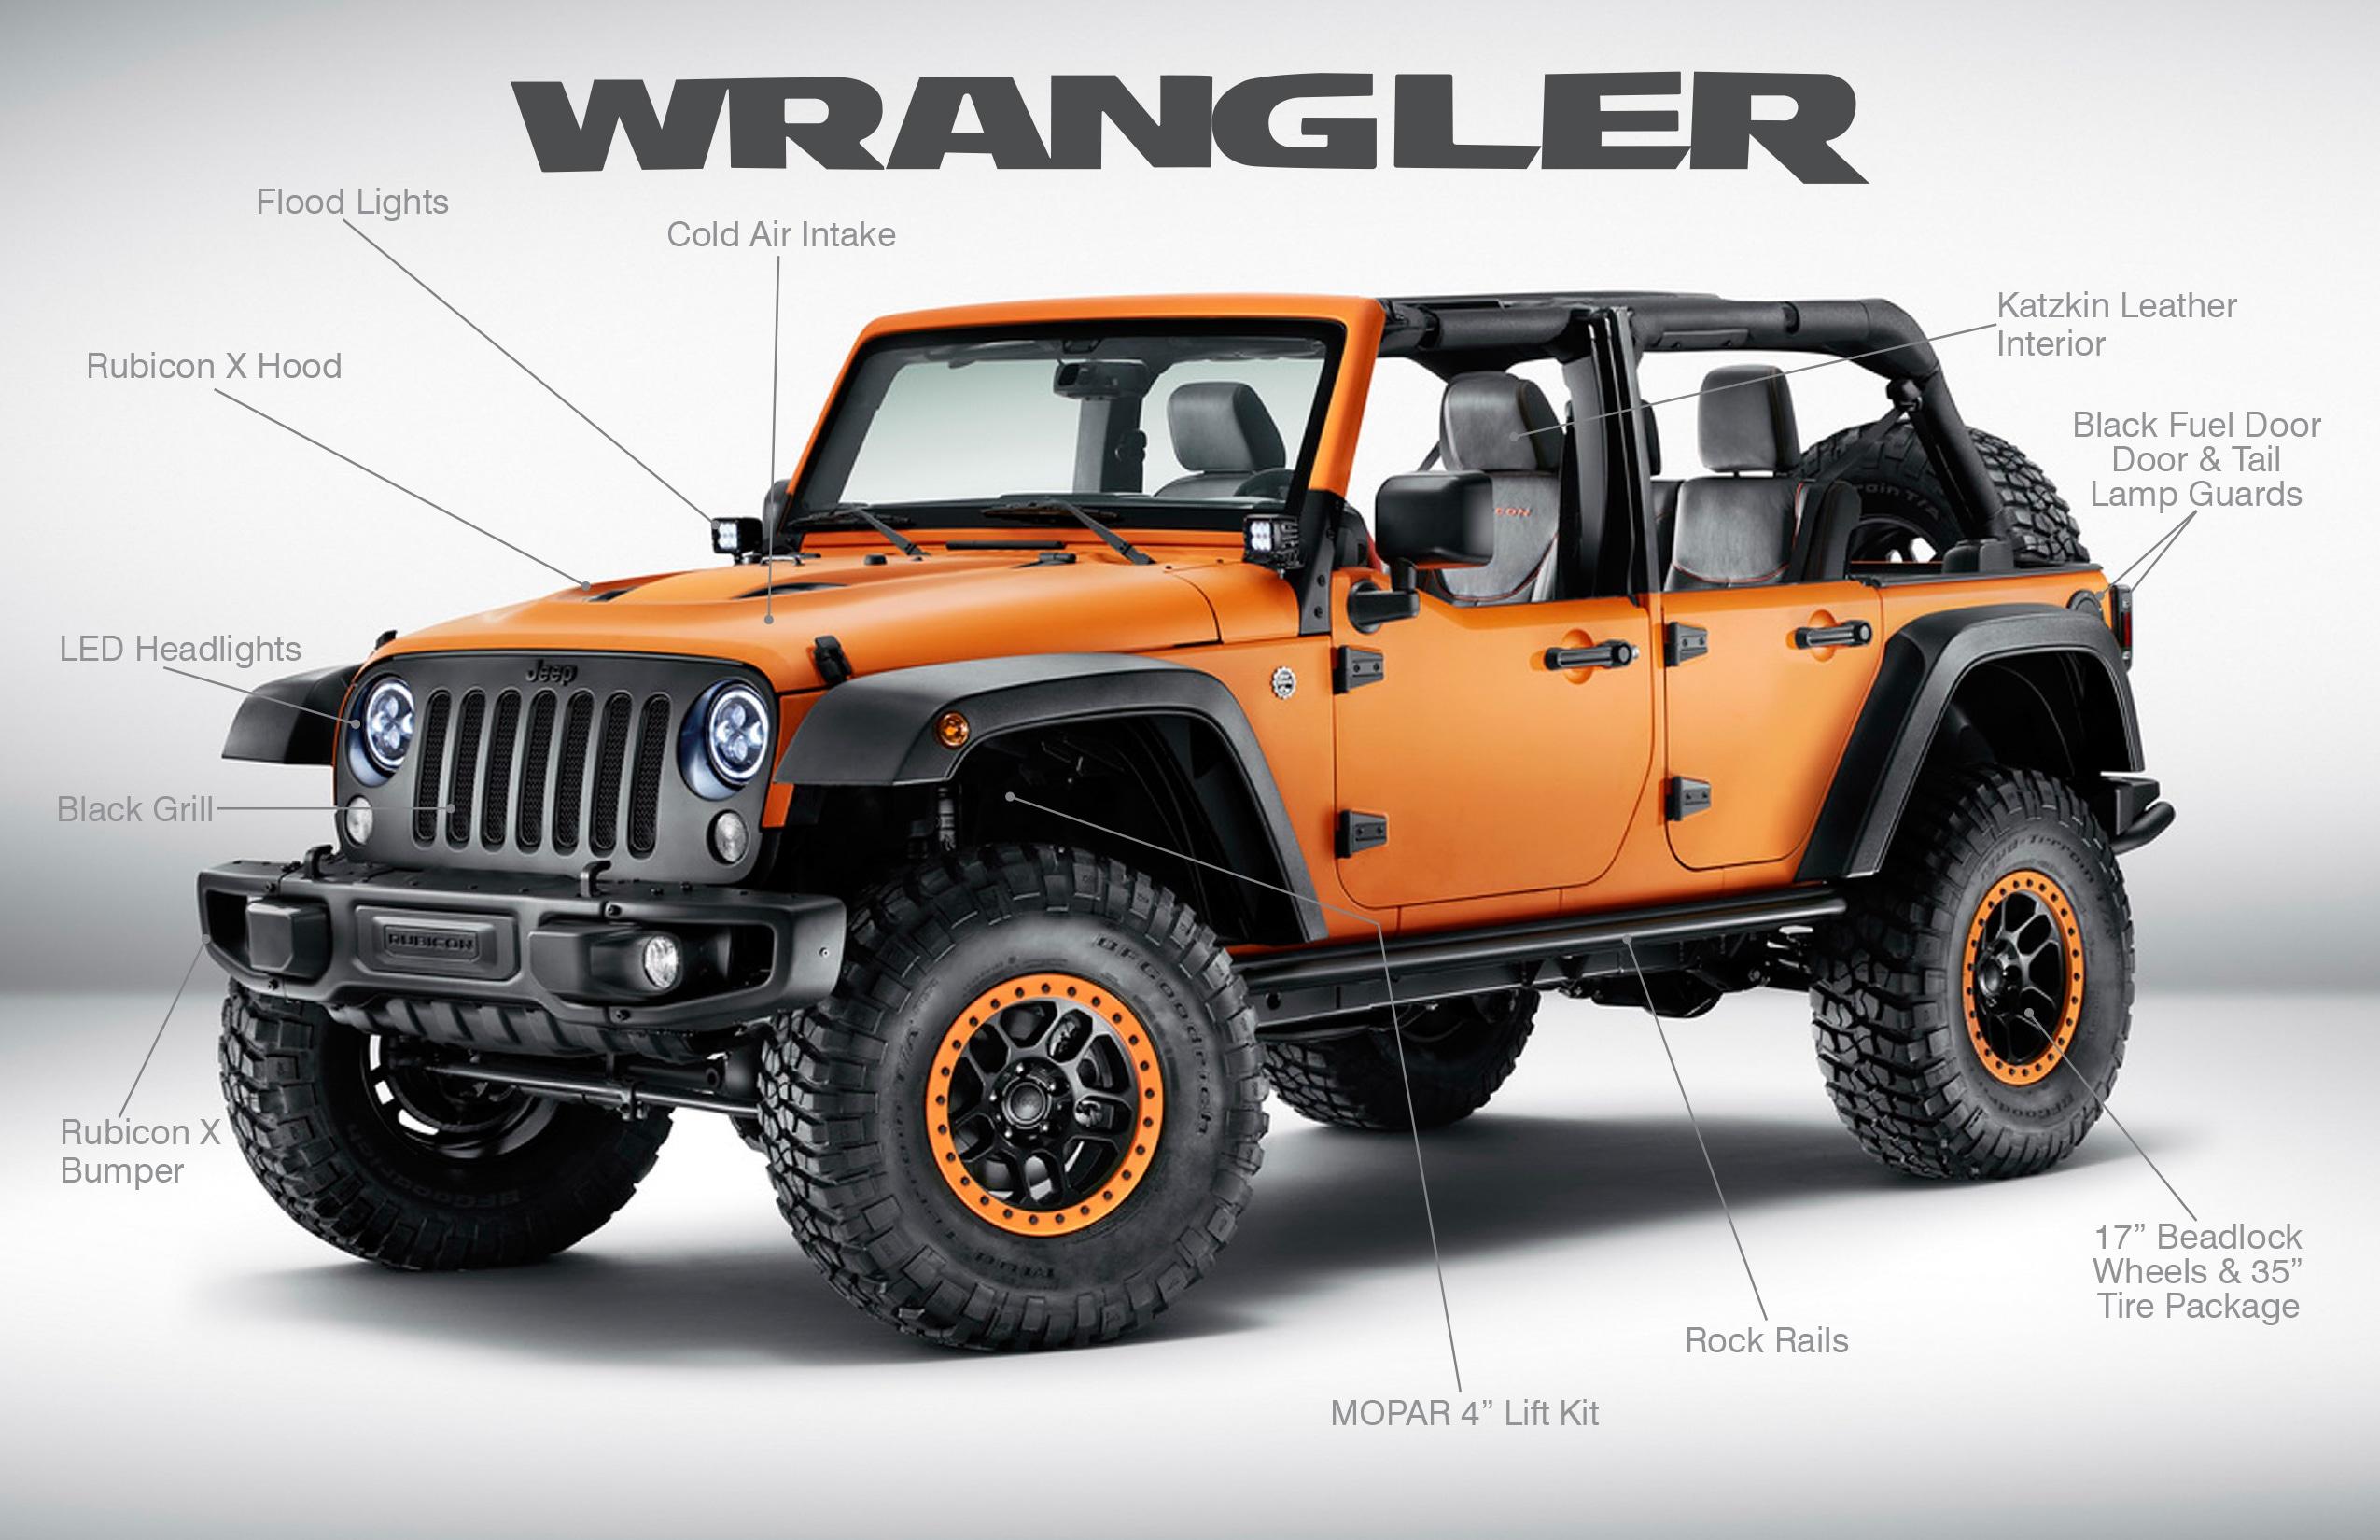 cerritos dodge chrysler jeep | new dodge, chrysler, jeep, ram